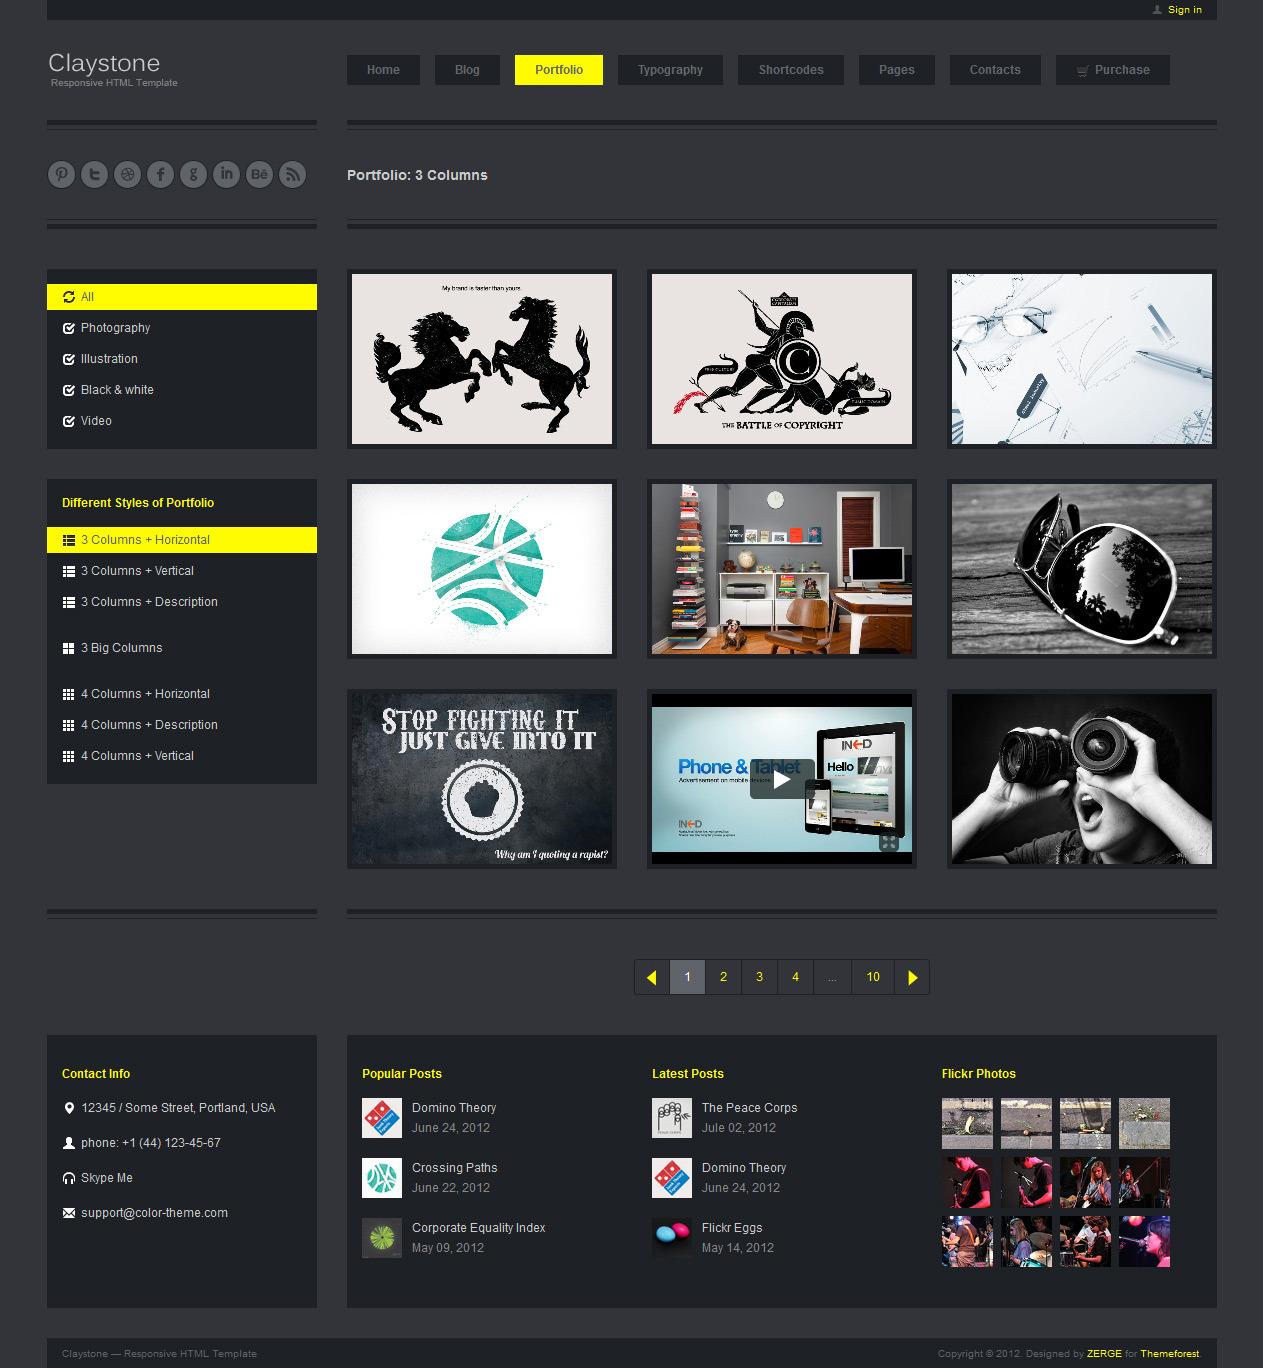 Claystone - Responsive HTML Template - 07 Portfolio 3Col Hor